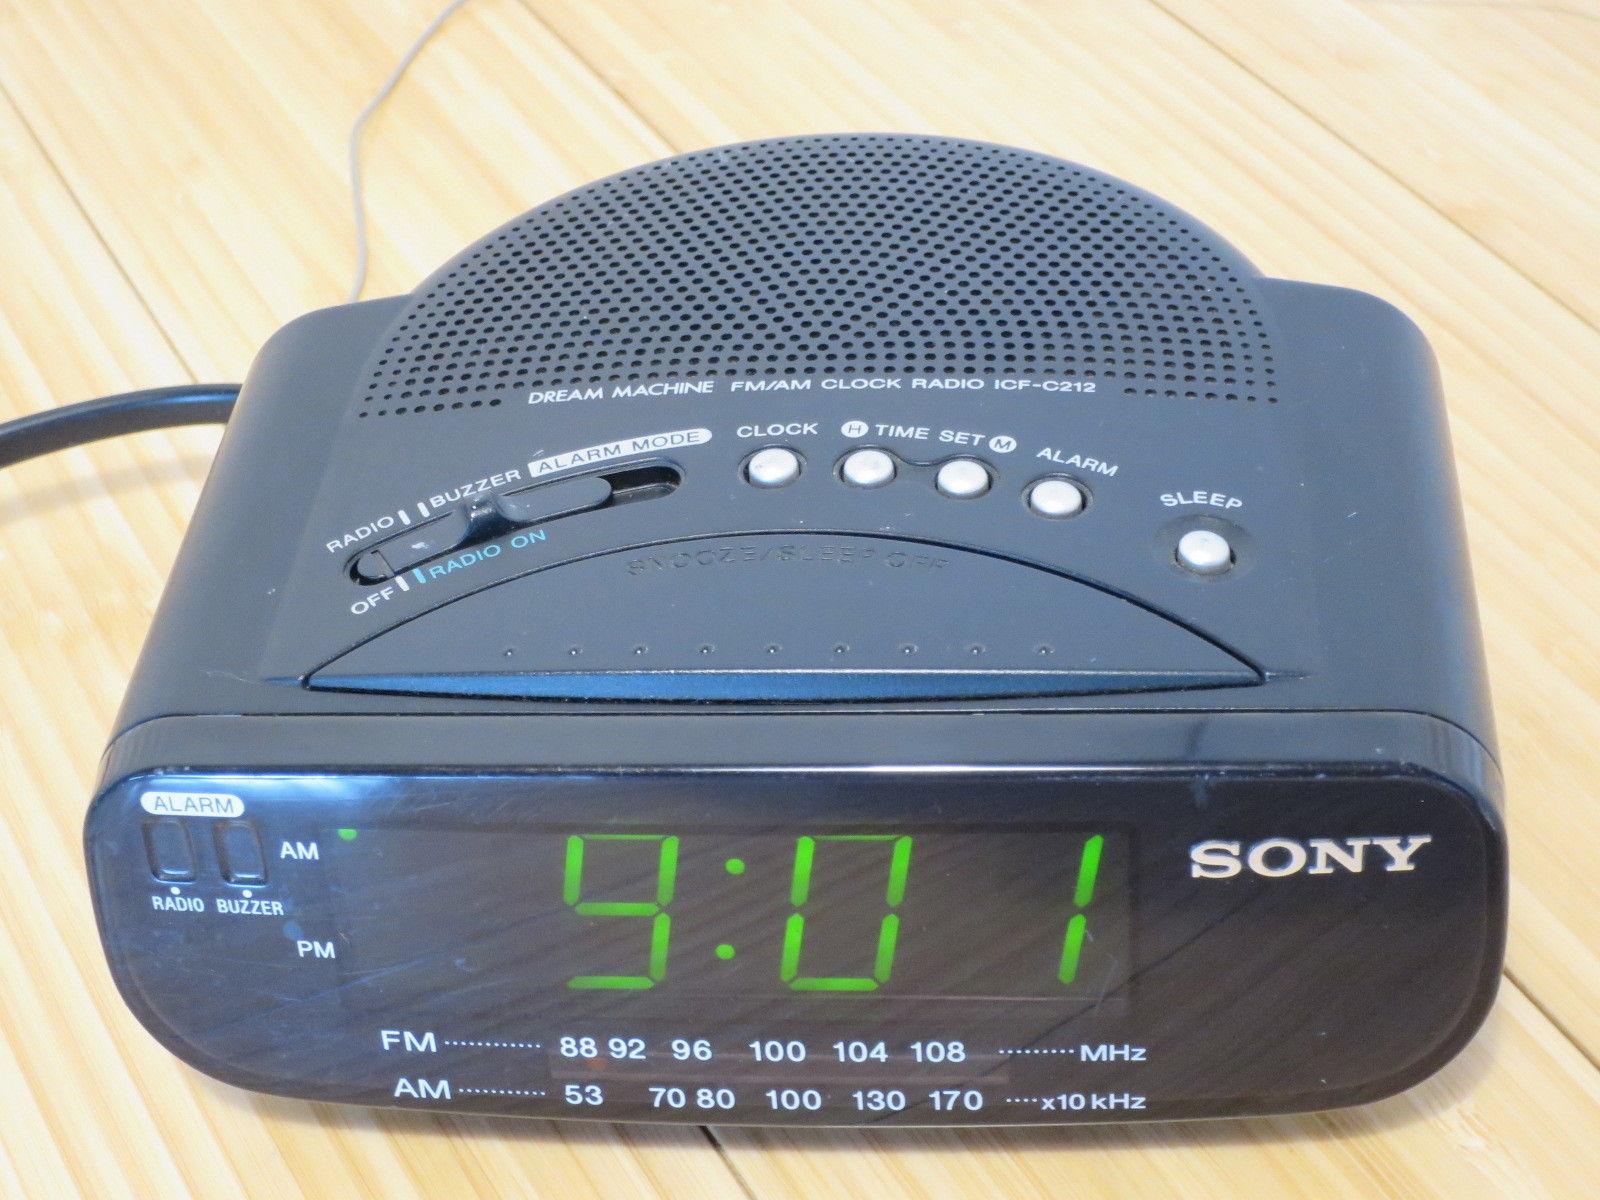 Sony Dream Machine Alarm Clock Radio AM FM and 50 similar items